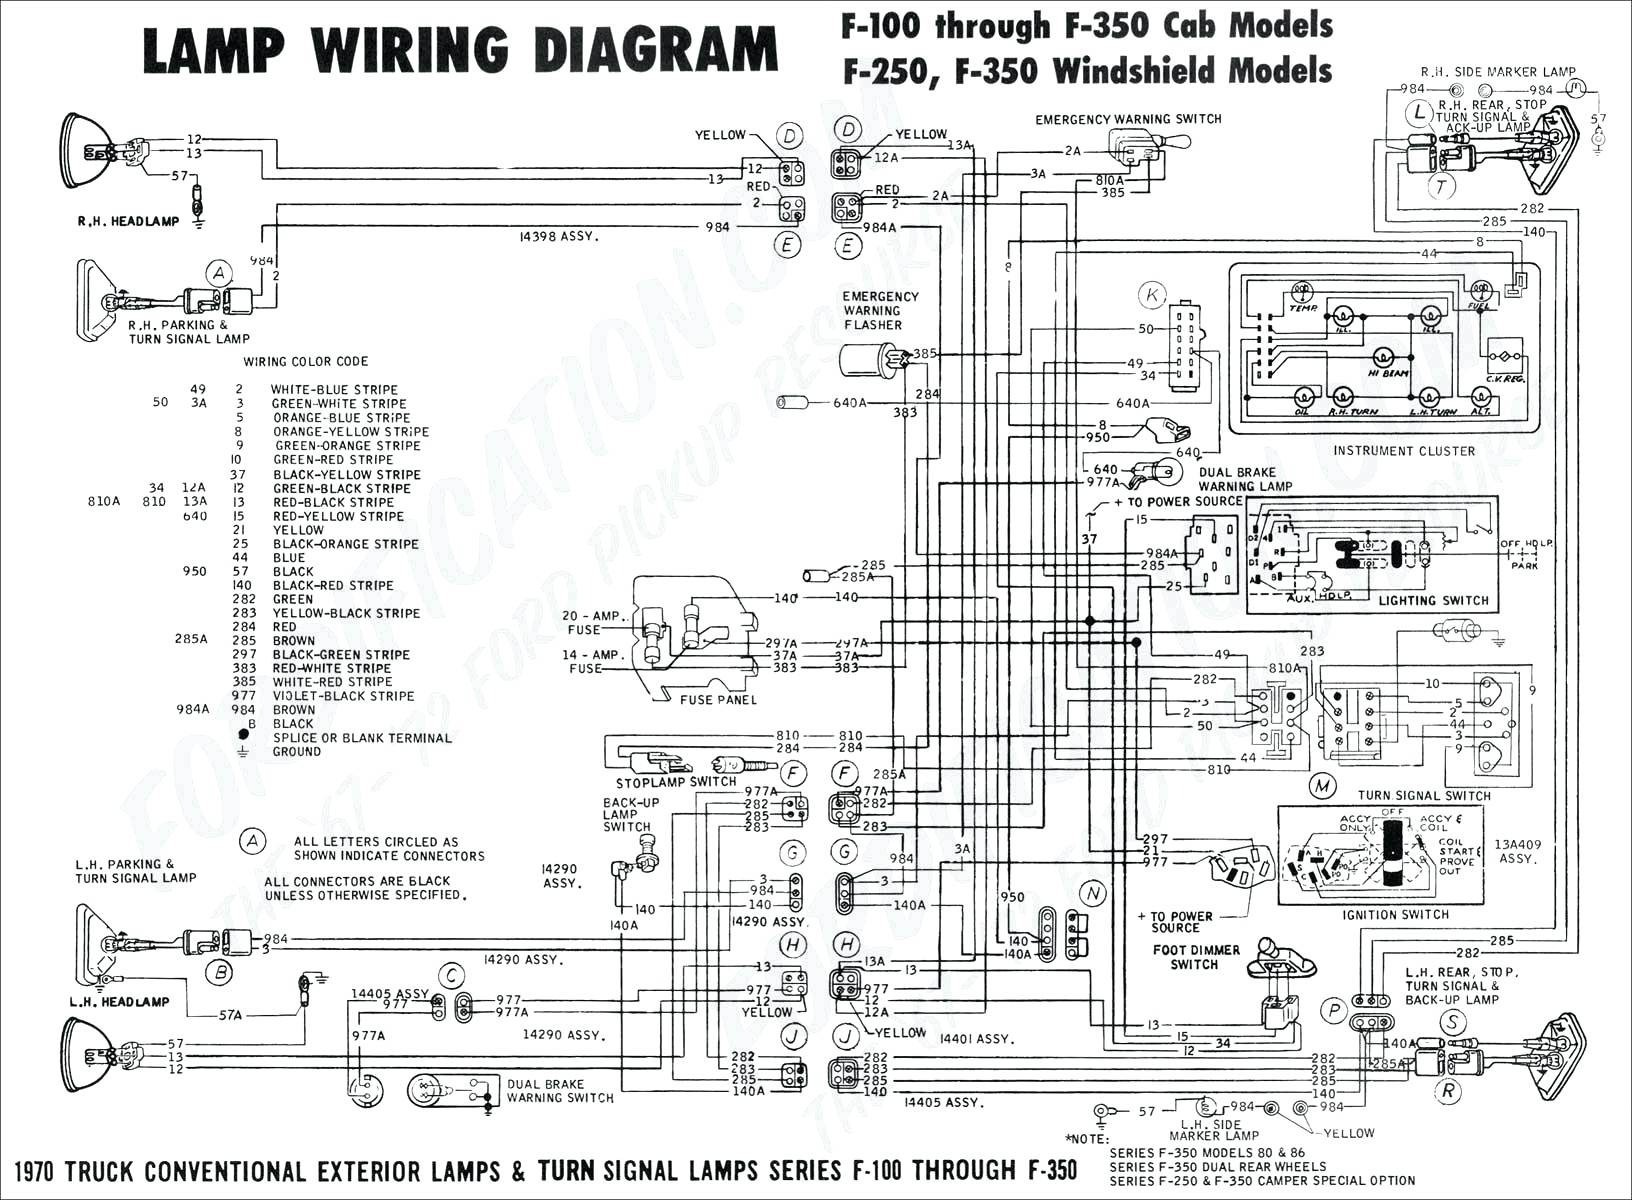 Trailer Light Wiring Diagram Utility Trailer Wiring Diagram originalstylophone Of Trailer Light Wiring Diagram